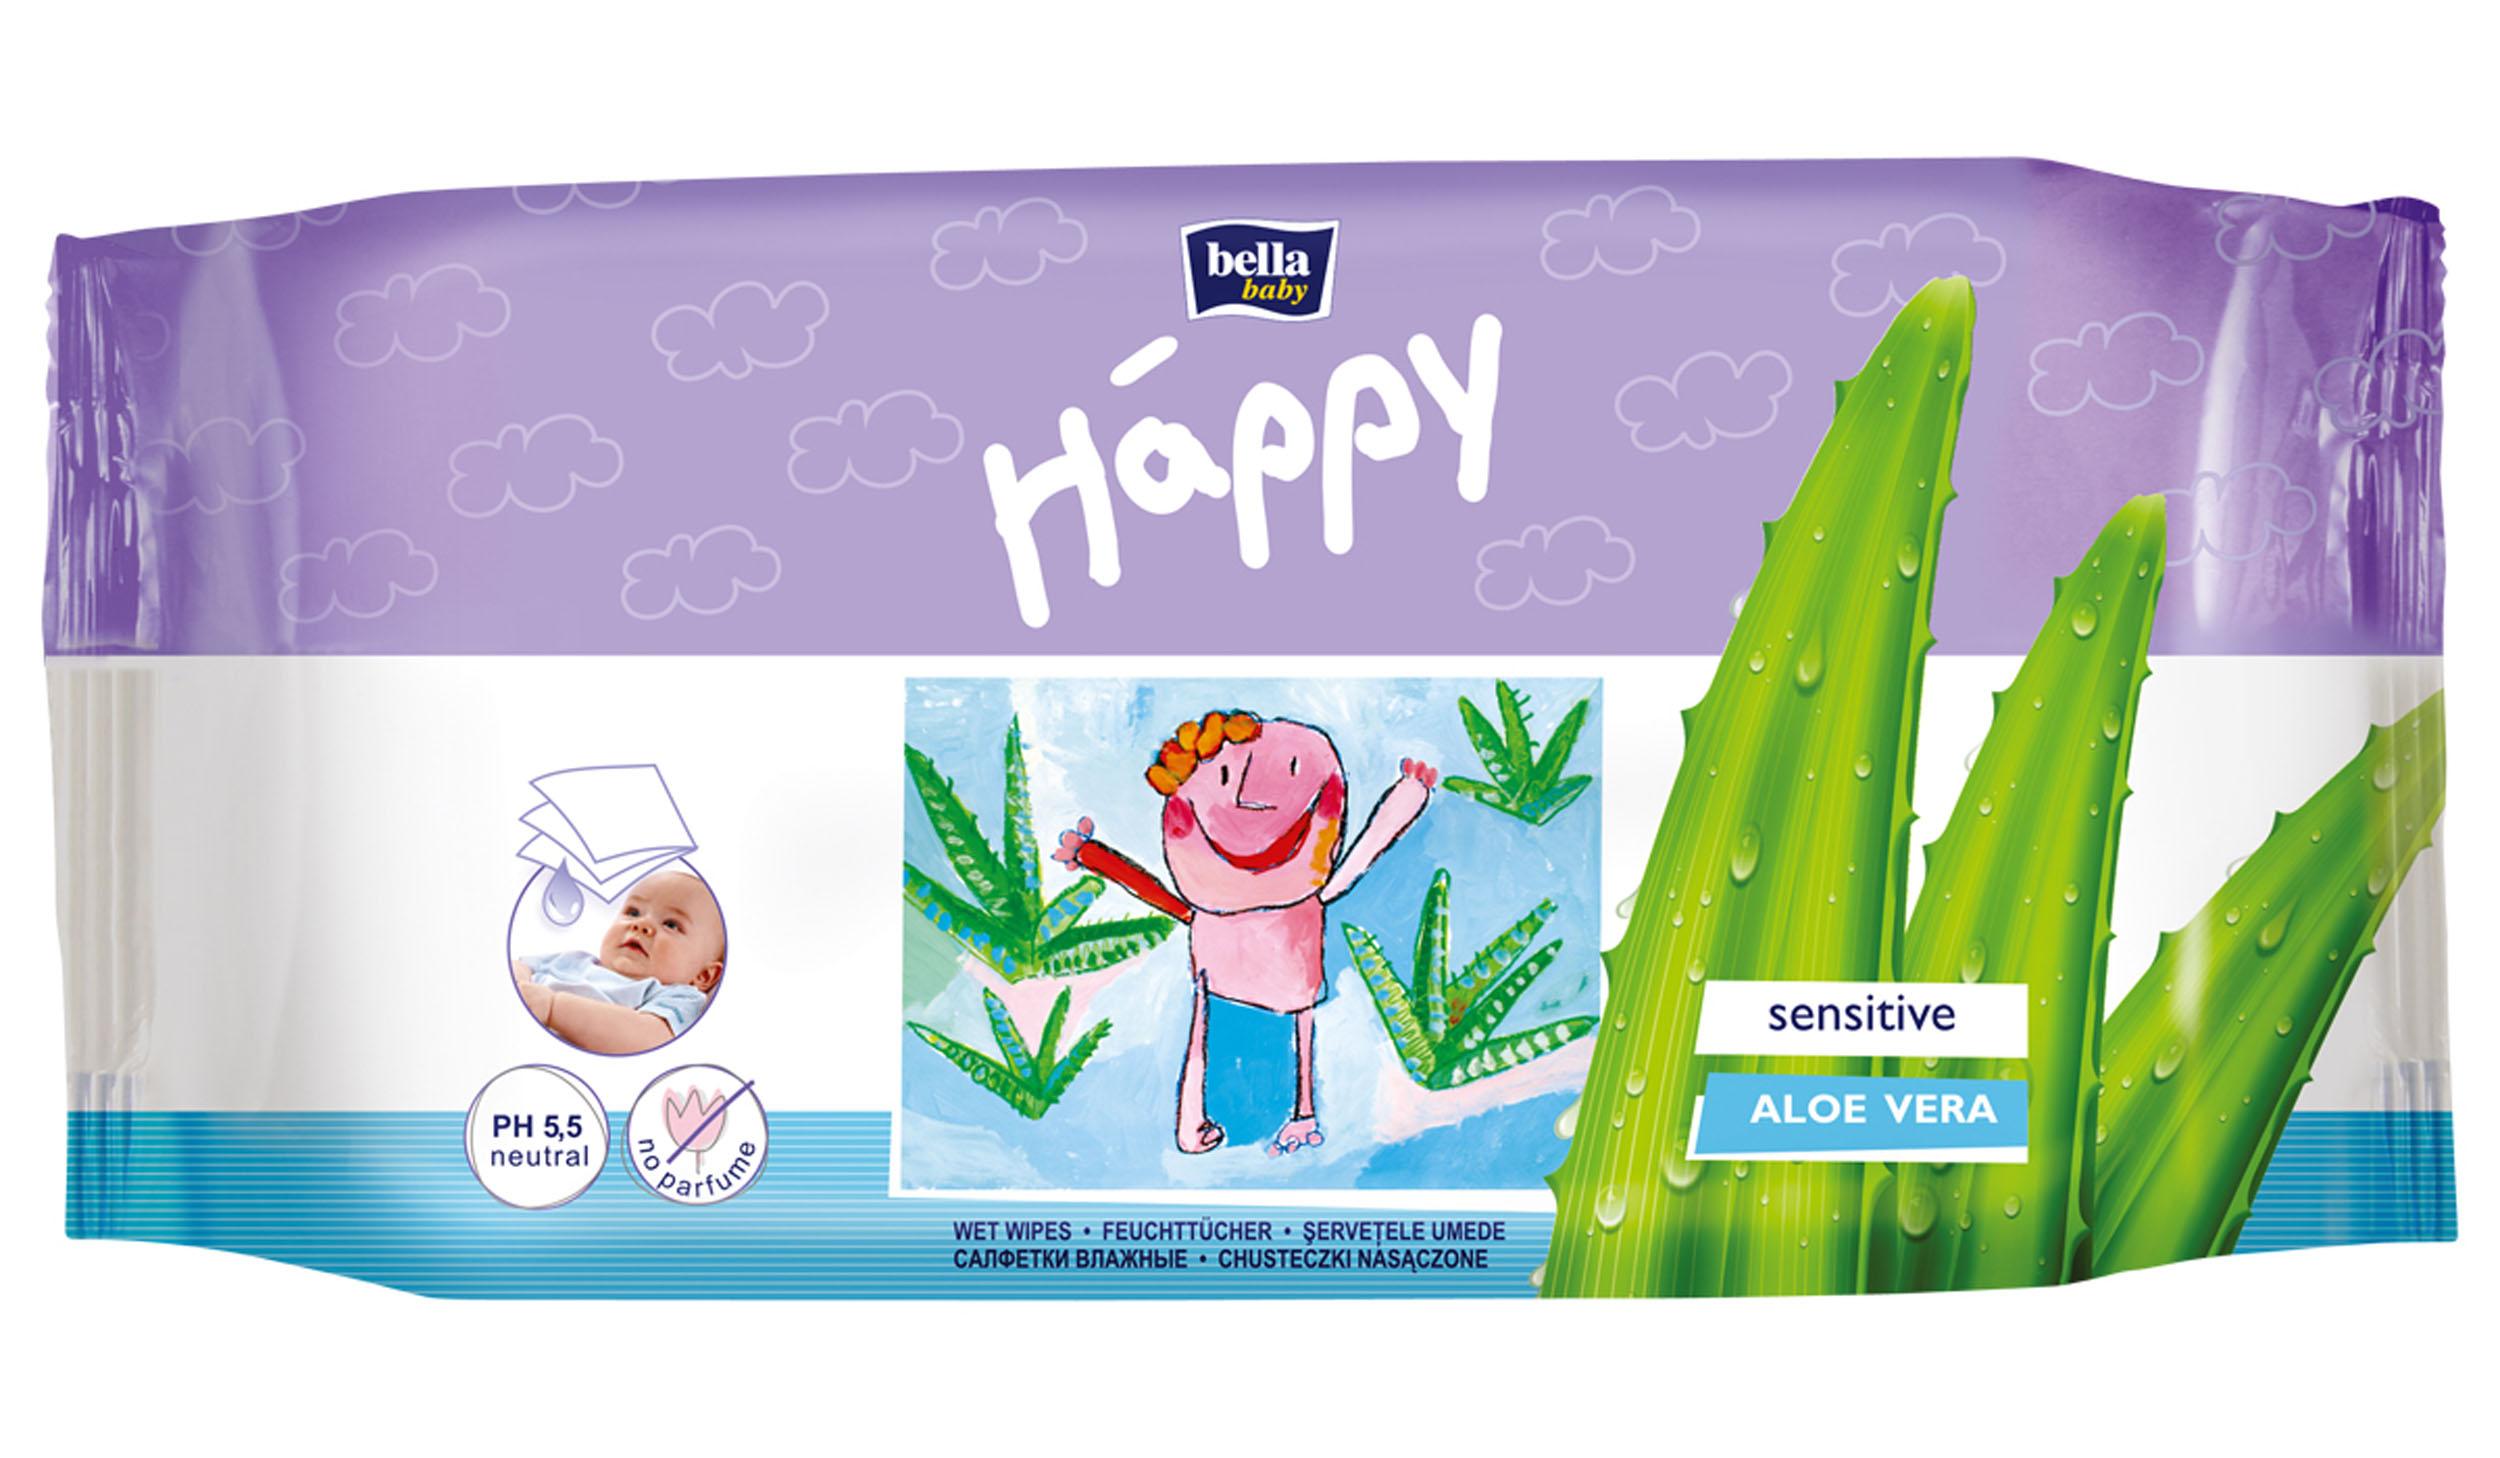 Bella Влажные салфетки Baby Happy Алое Вера, 56 шт bella влажные салфетки baby happy молоко и мед 64 шт